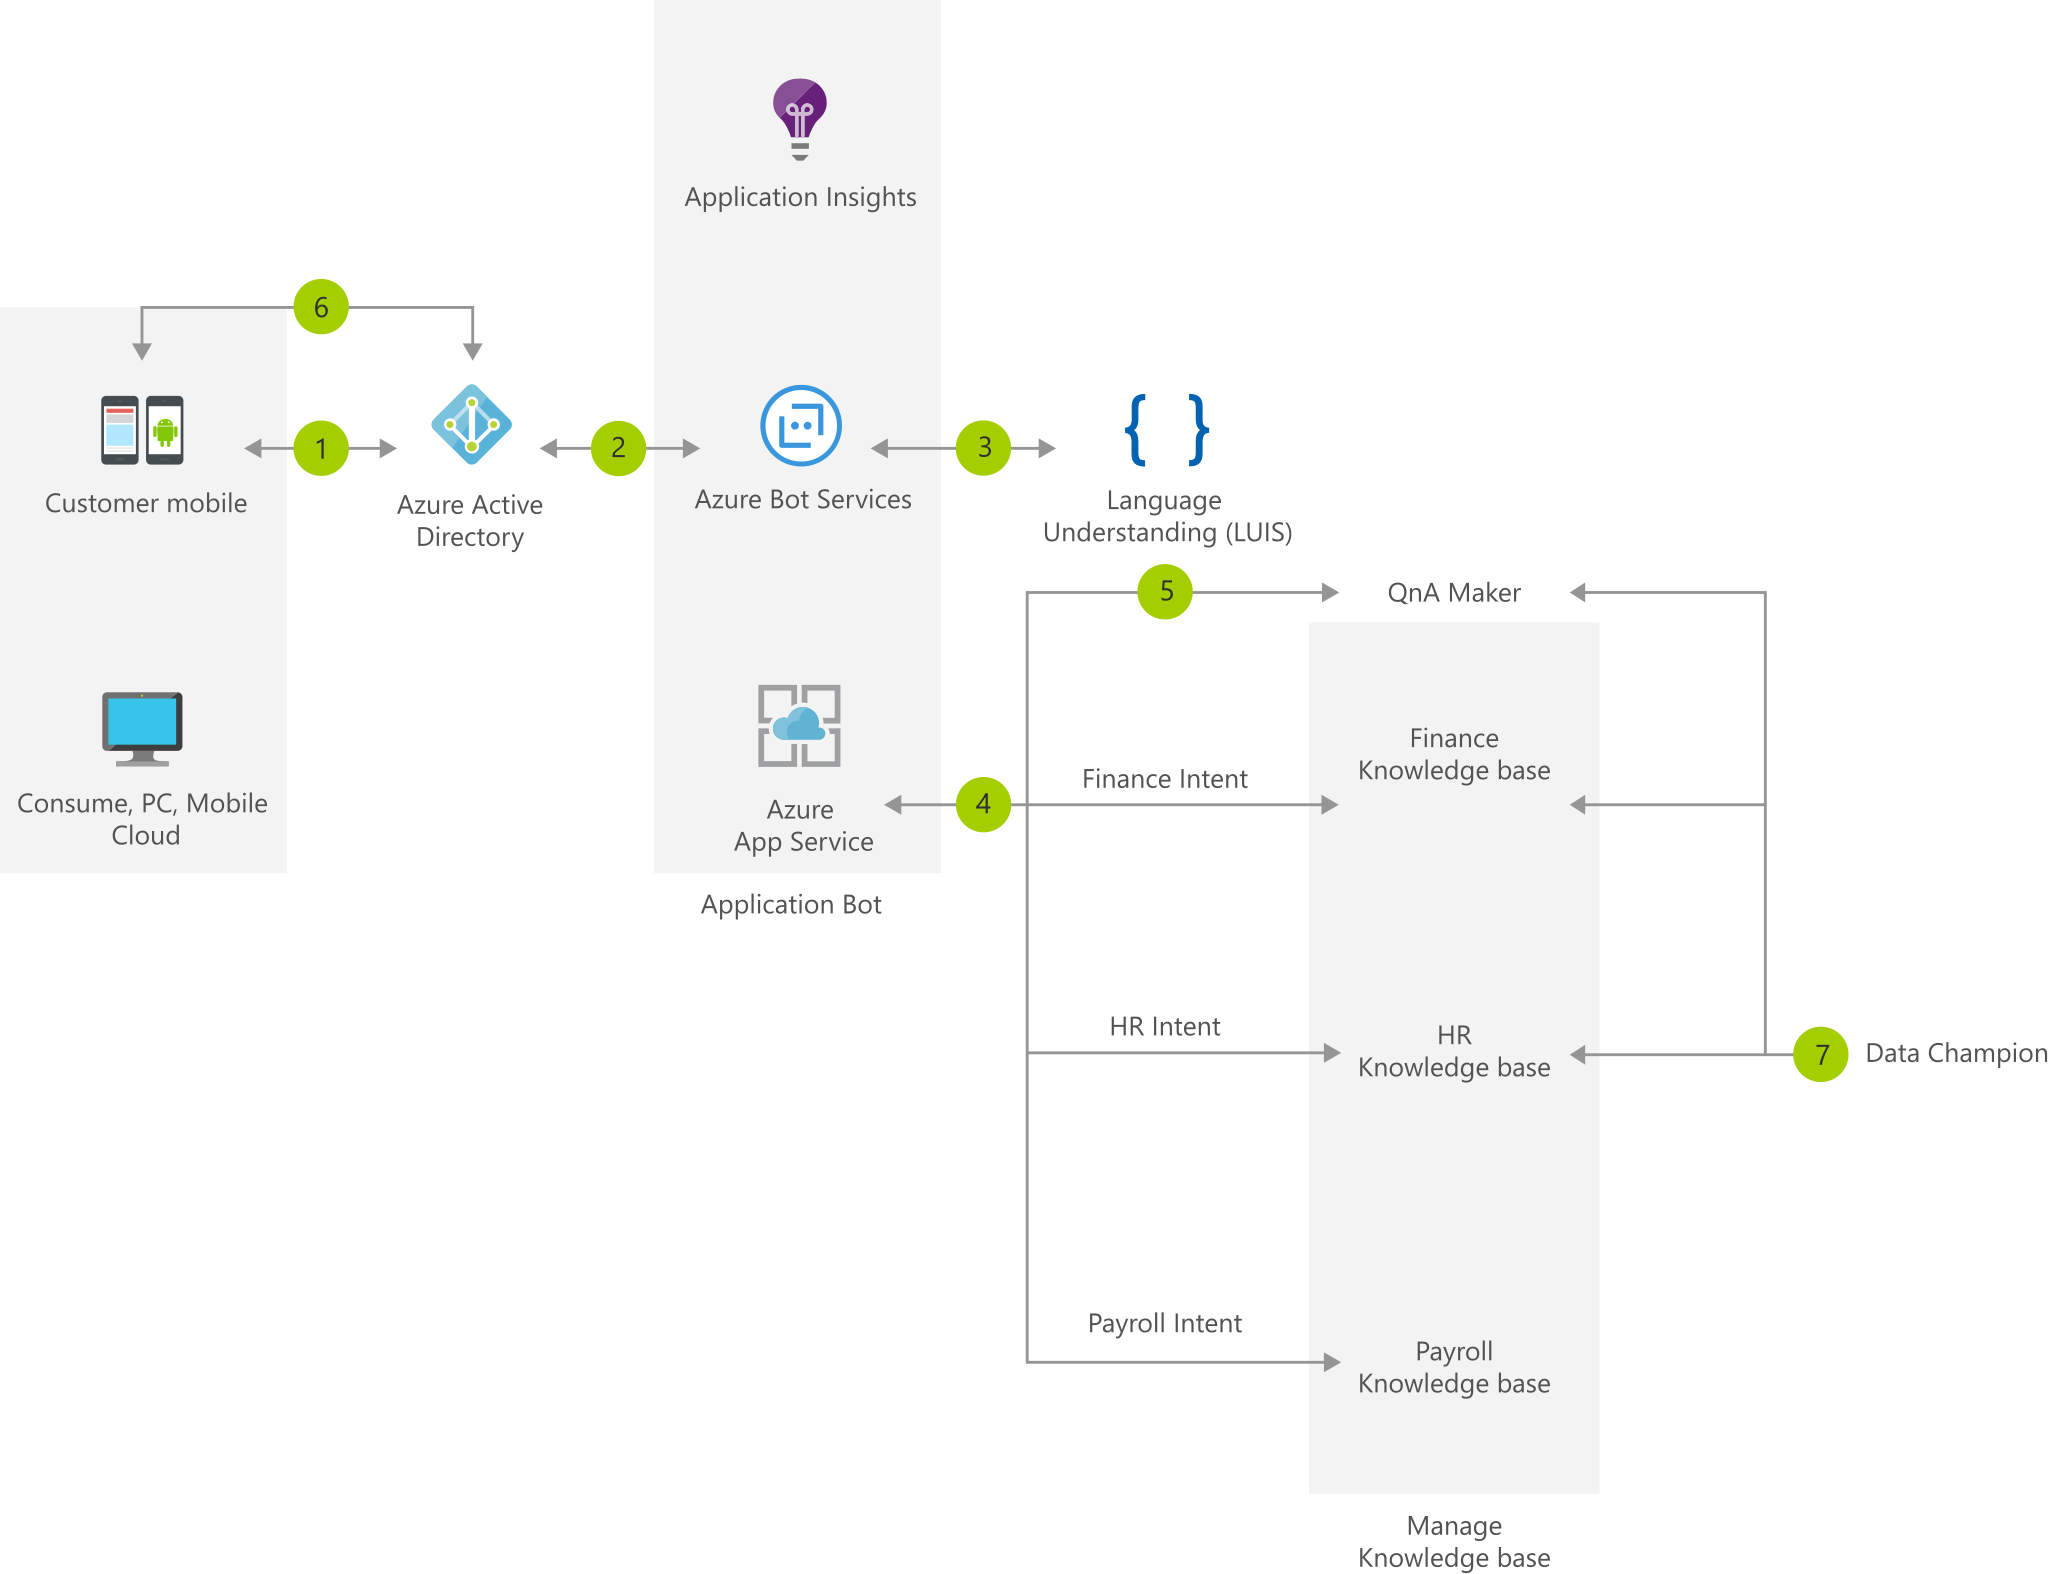 FAQ Chatbot with data champion model